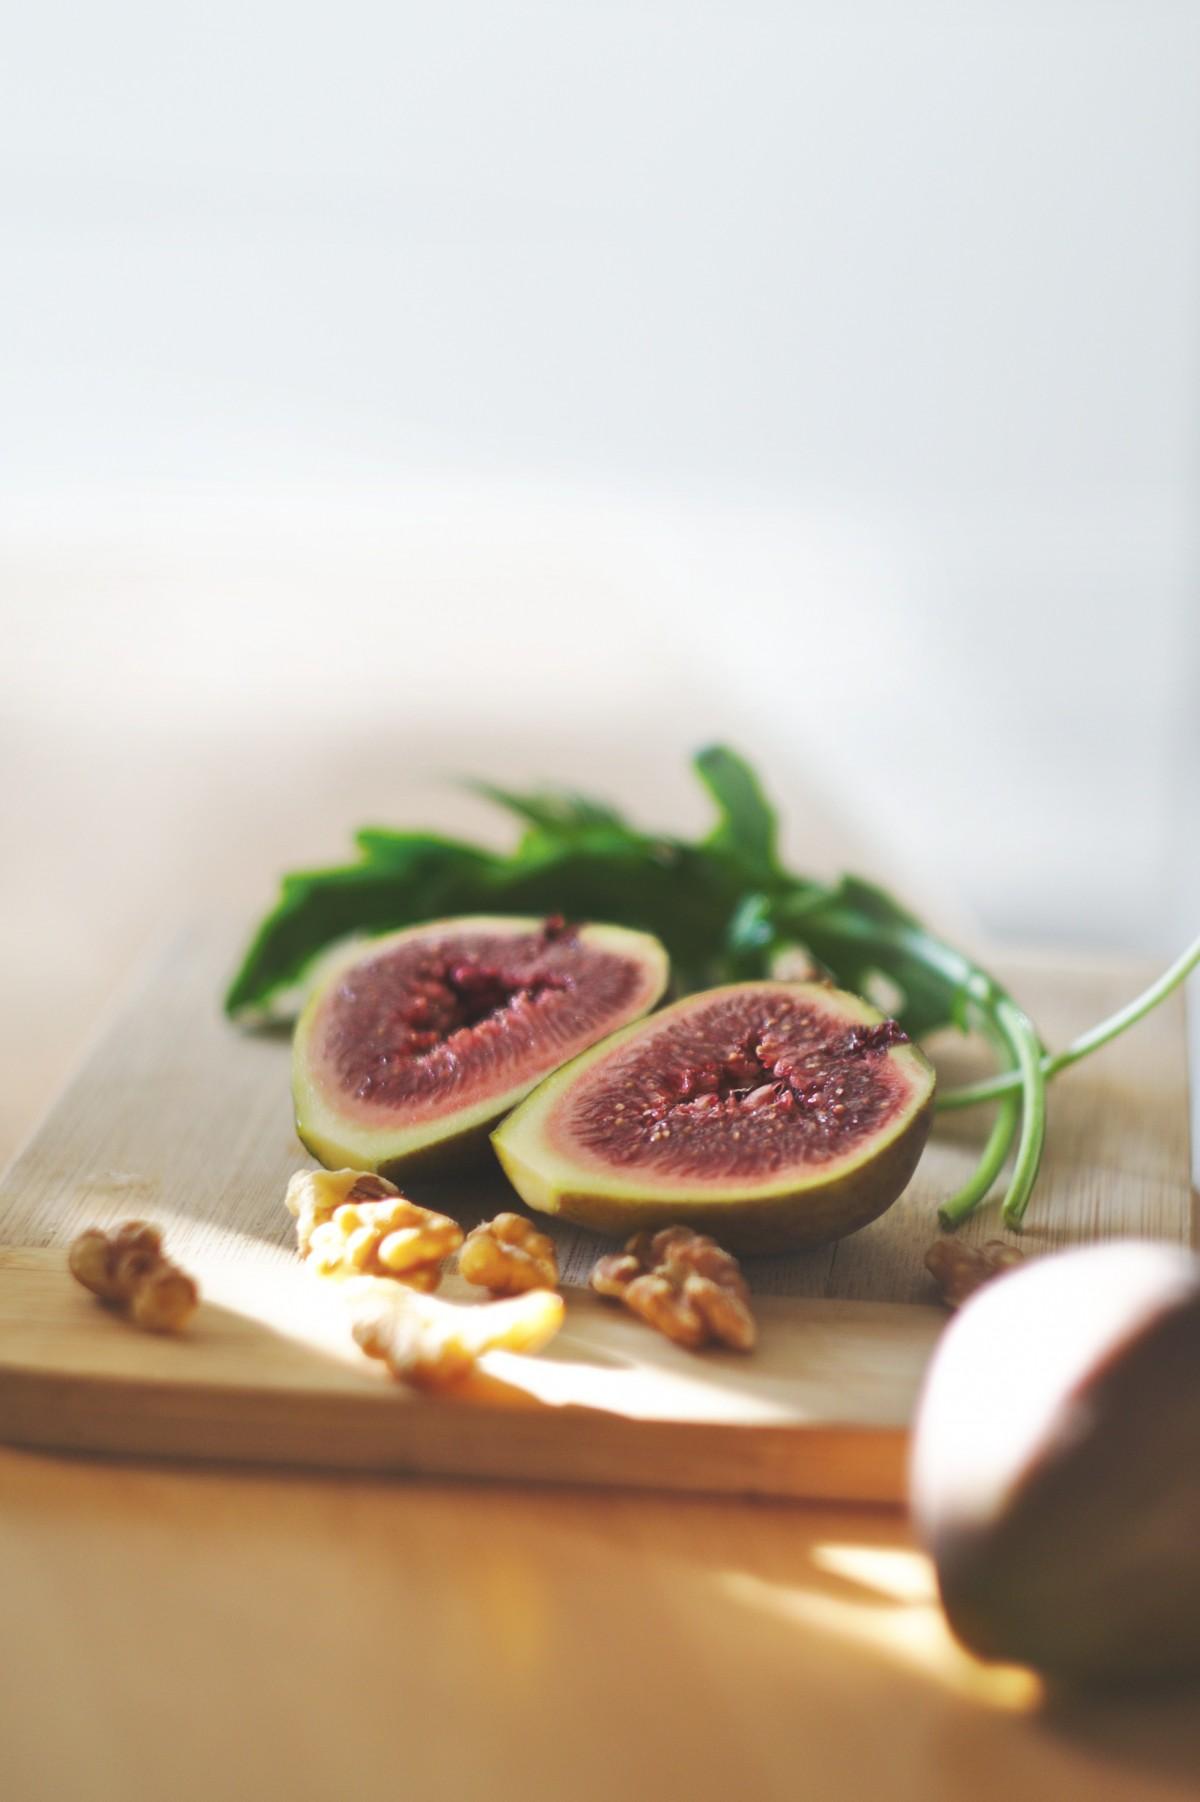 Fotos gratis difuminar fruta plato comida produce - Cortar hierba alta ...